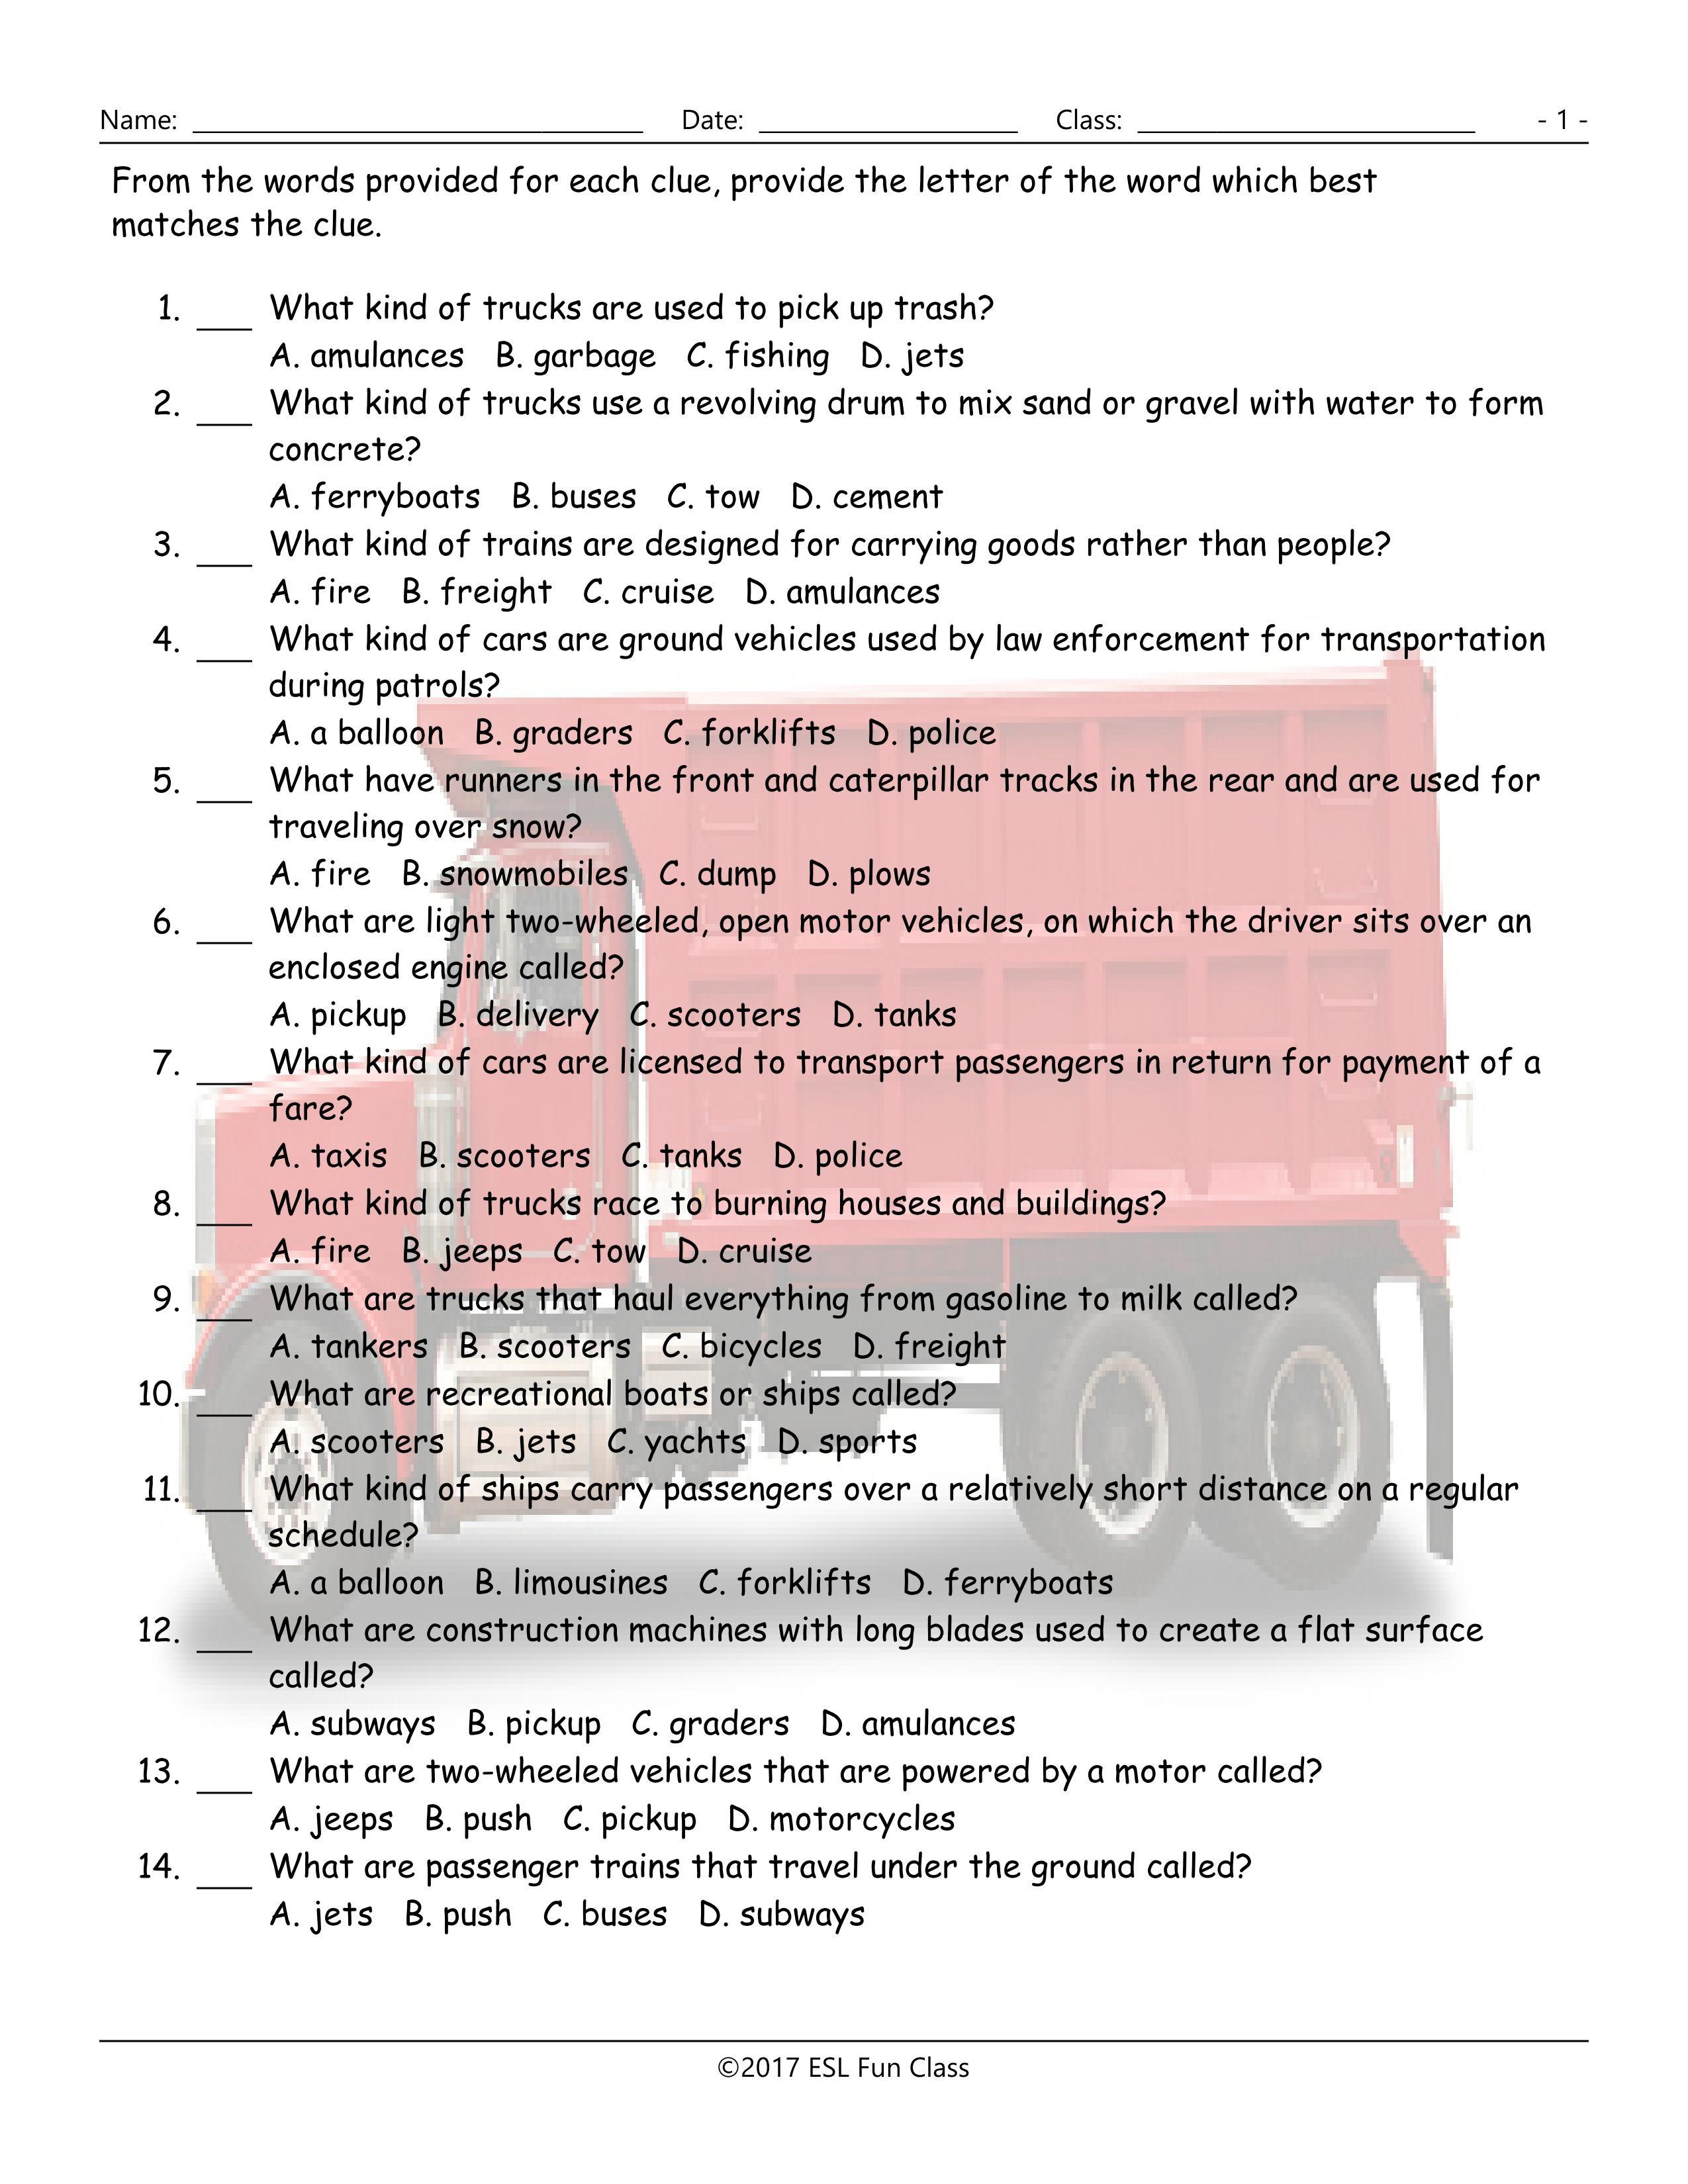 Transportation-Vehicles Multiple Choice Worksheet-Esl Fun Games-Have - Free Printable Multiple Choice Worksheets